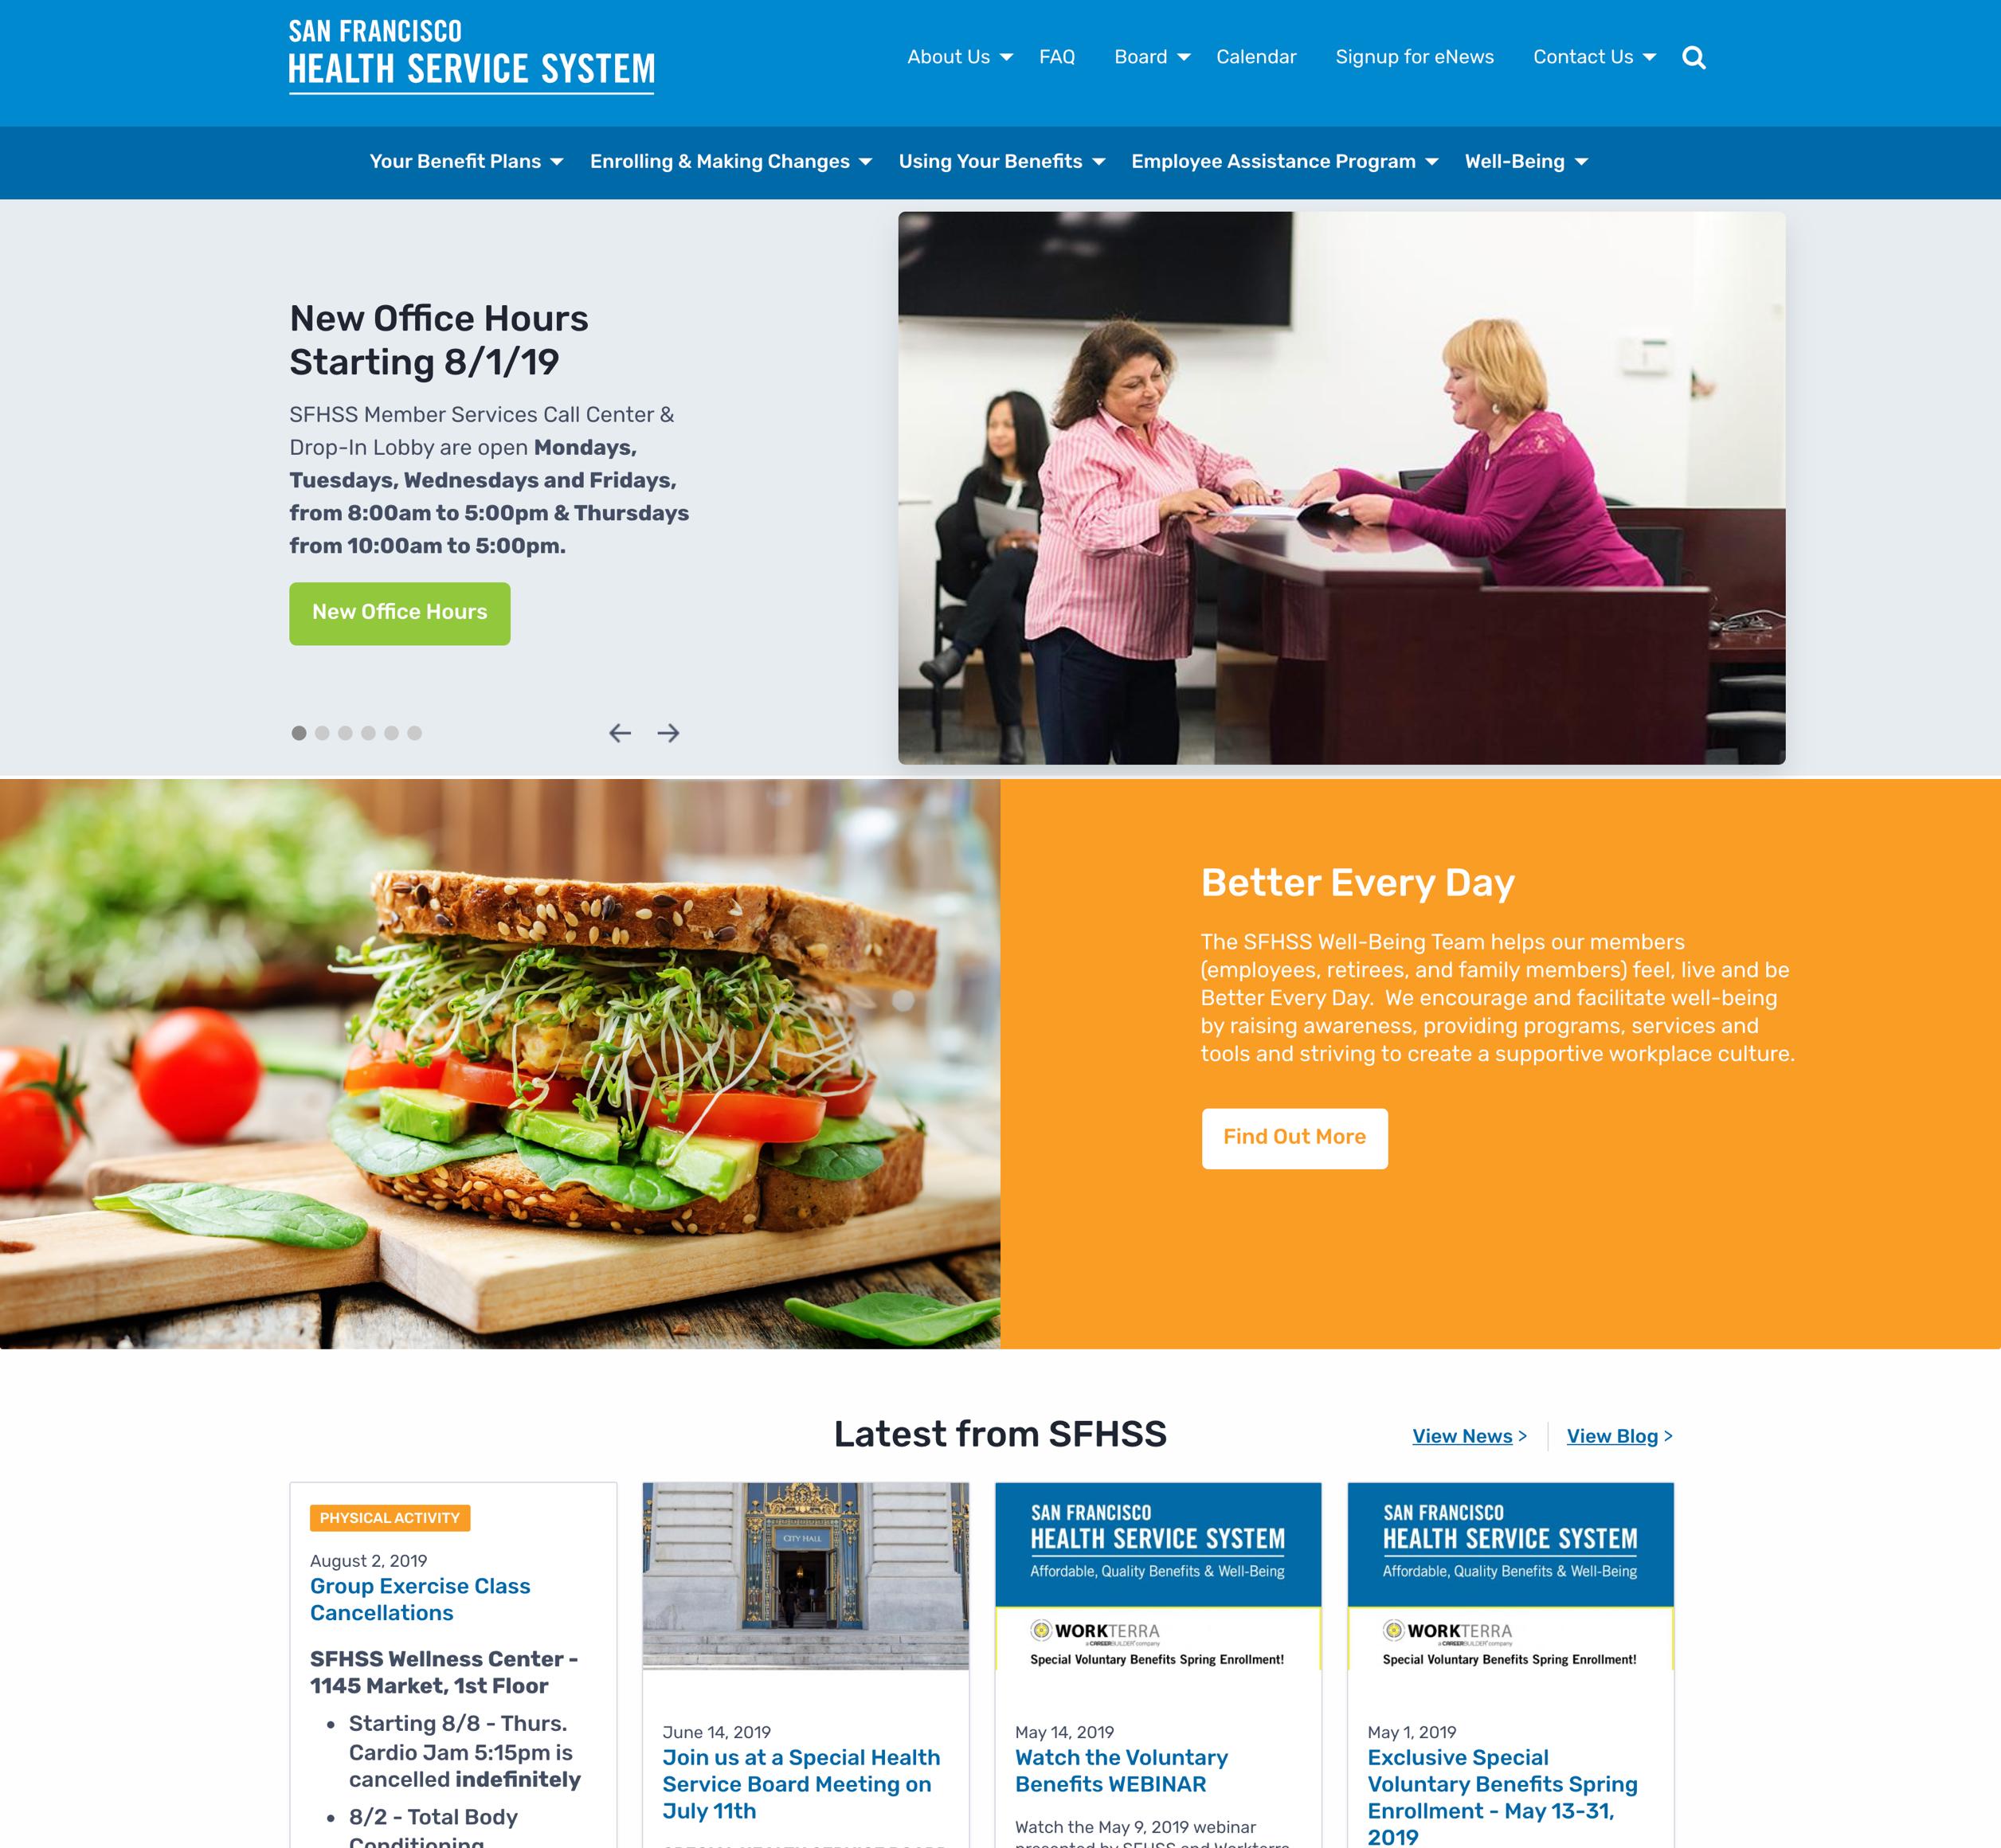 A screenshot of San Francisco's Heath Service System's homepage, a Kanopi Studios case study.